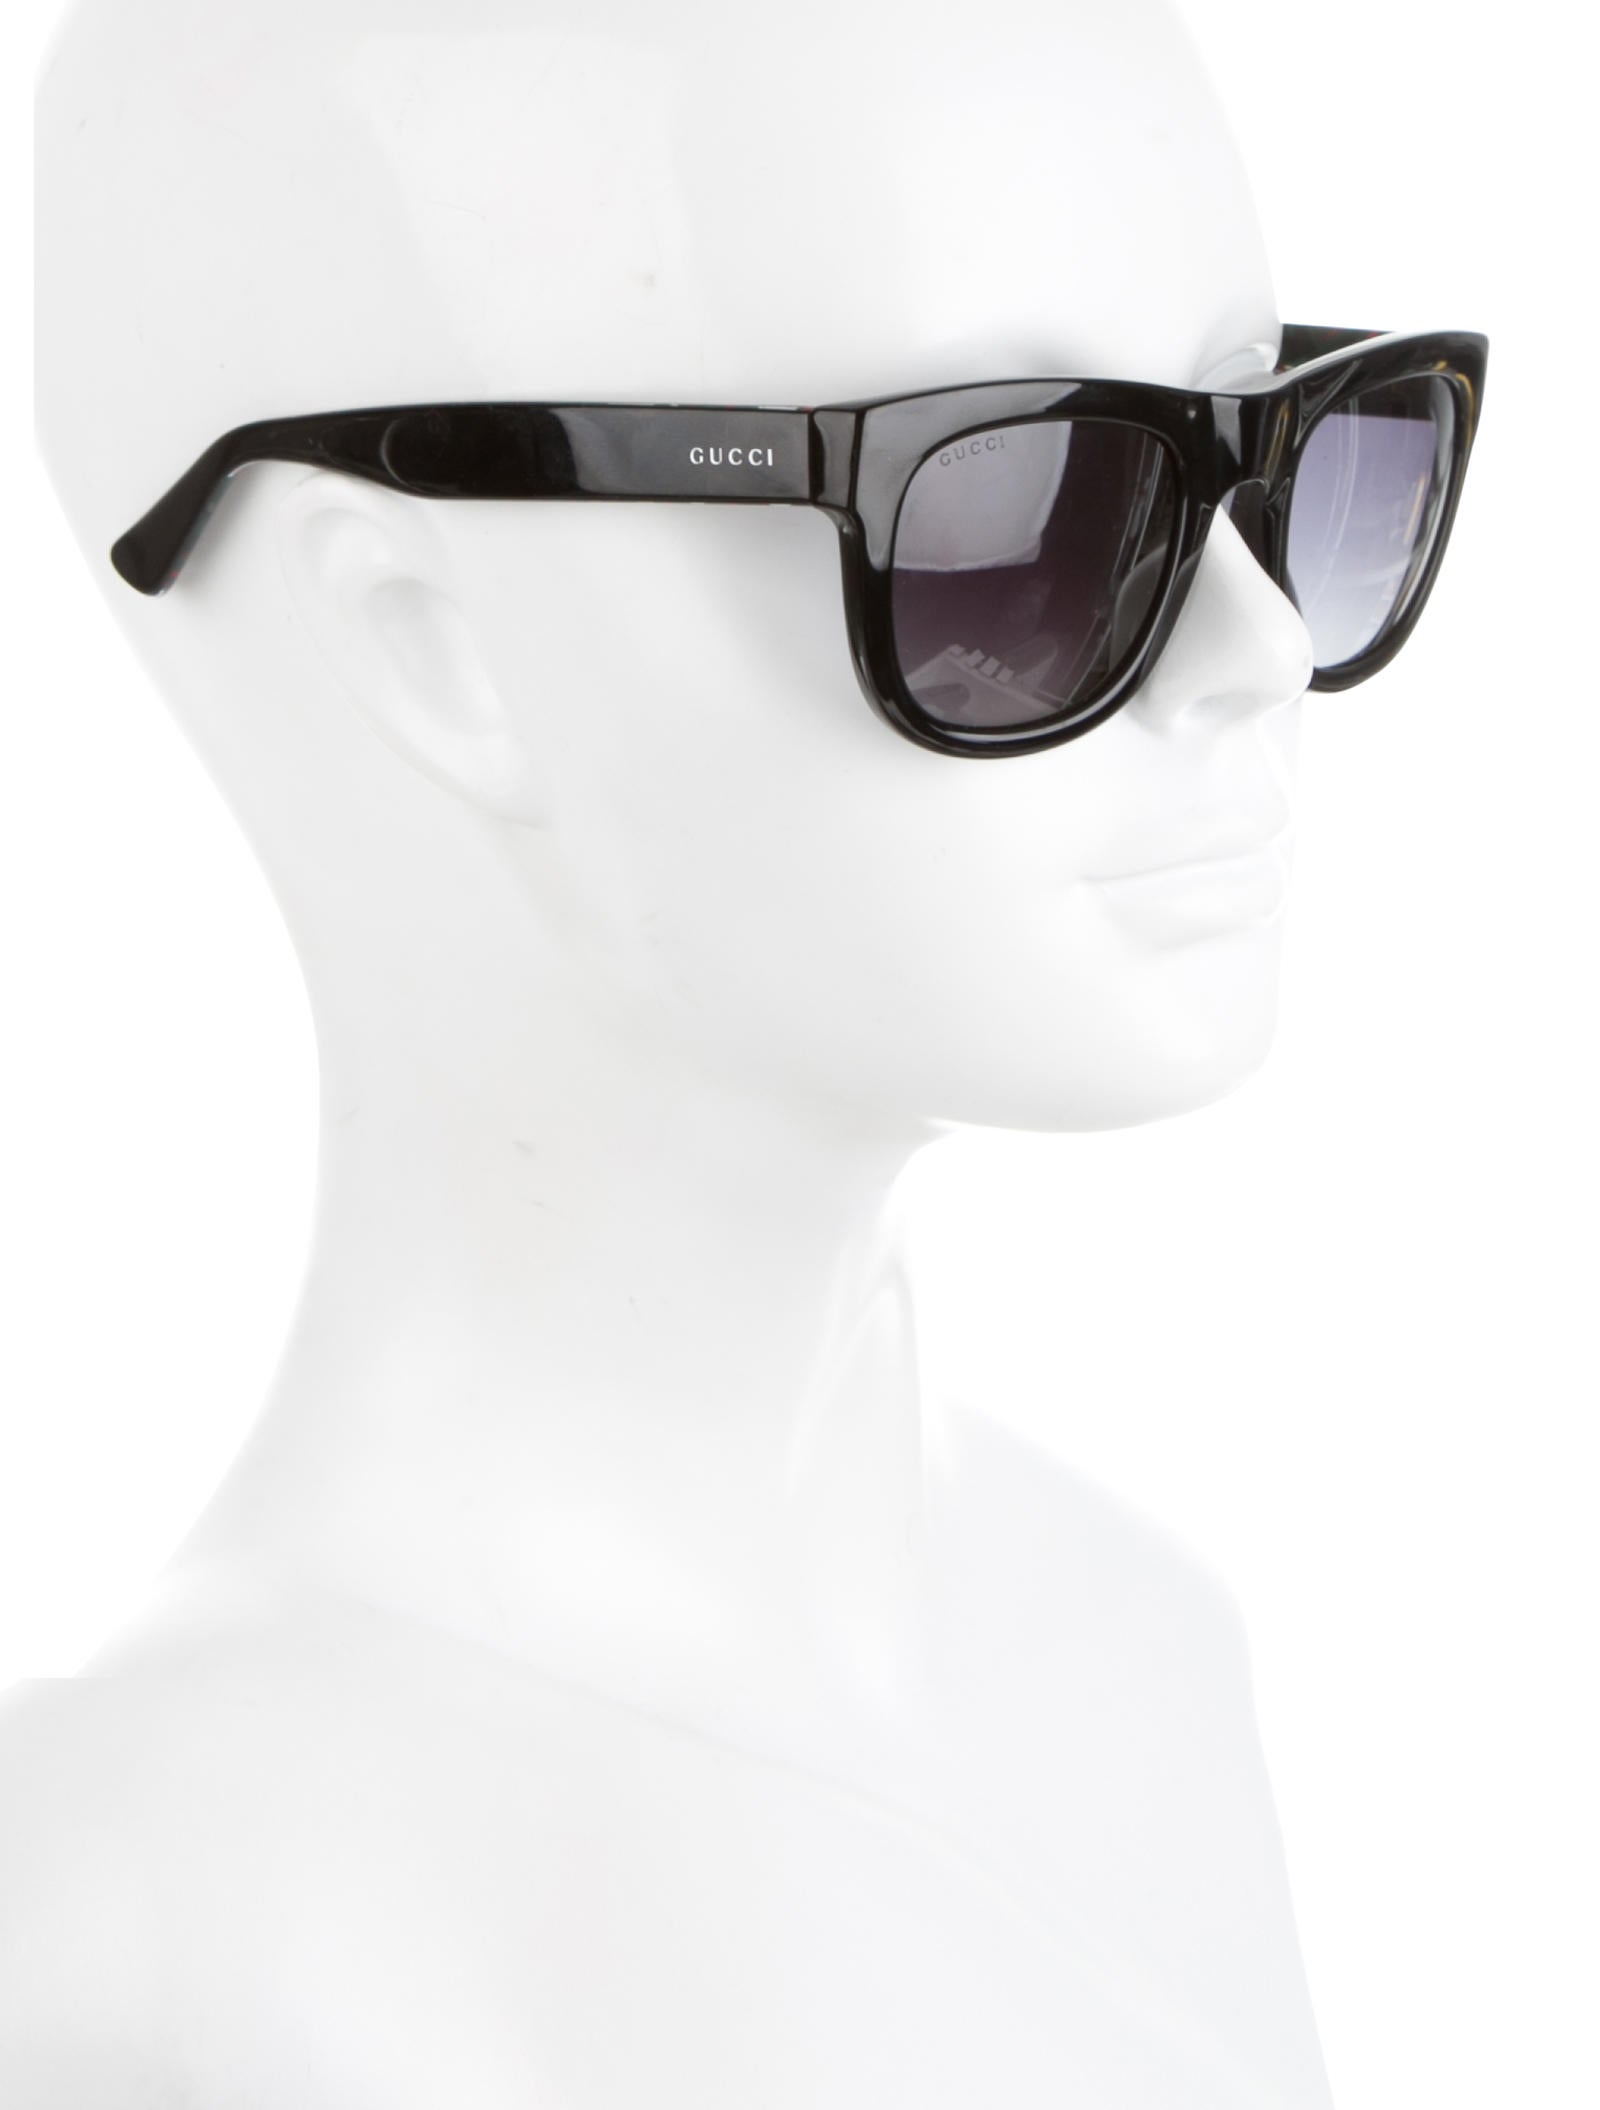 1ecaa94719d Gucci Mens Wayfarer Sunglasses - Bitterroot Public Library